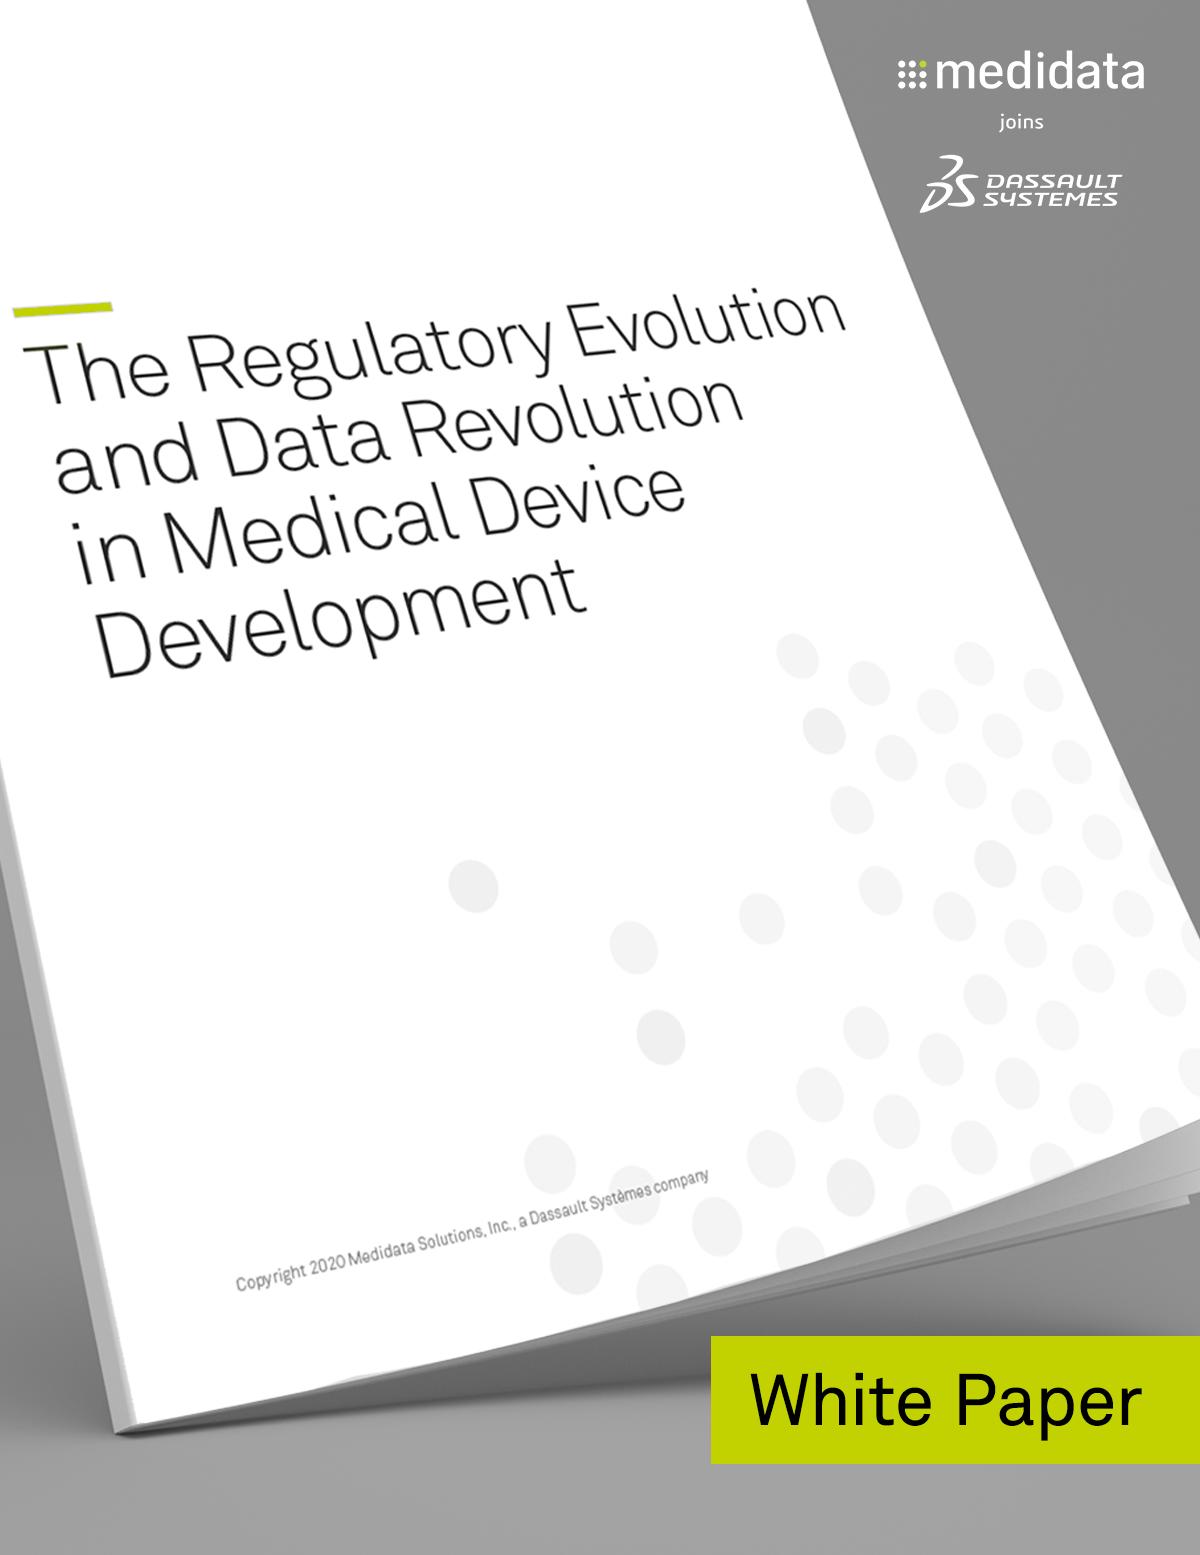 The Regulatory Evolution and Data Revolution in Medical Device Development